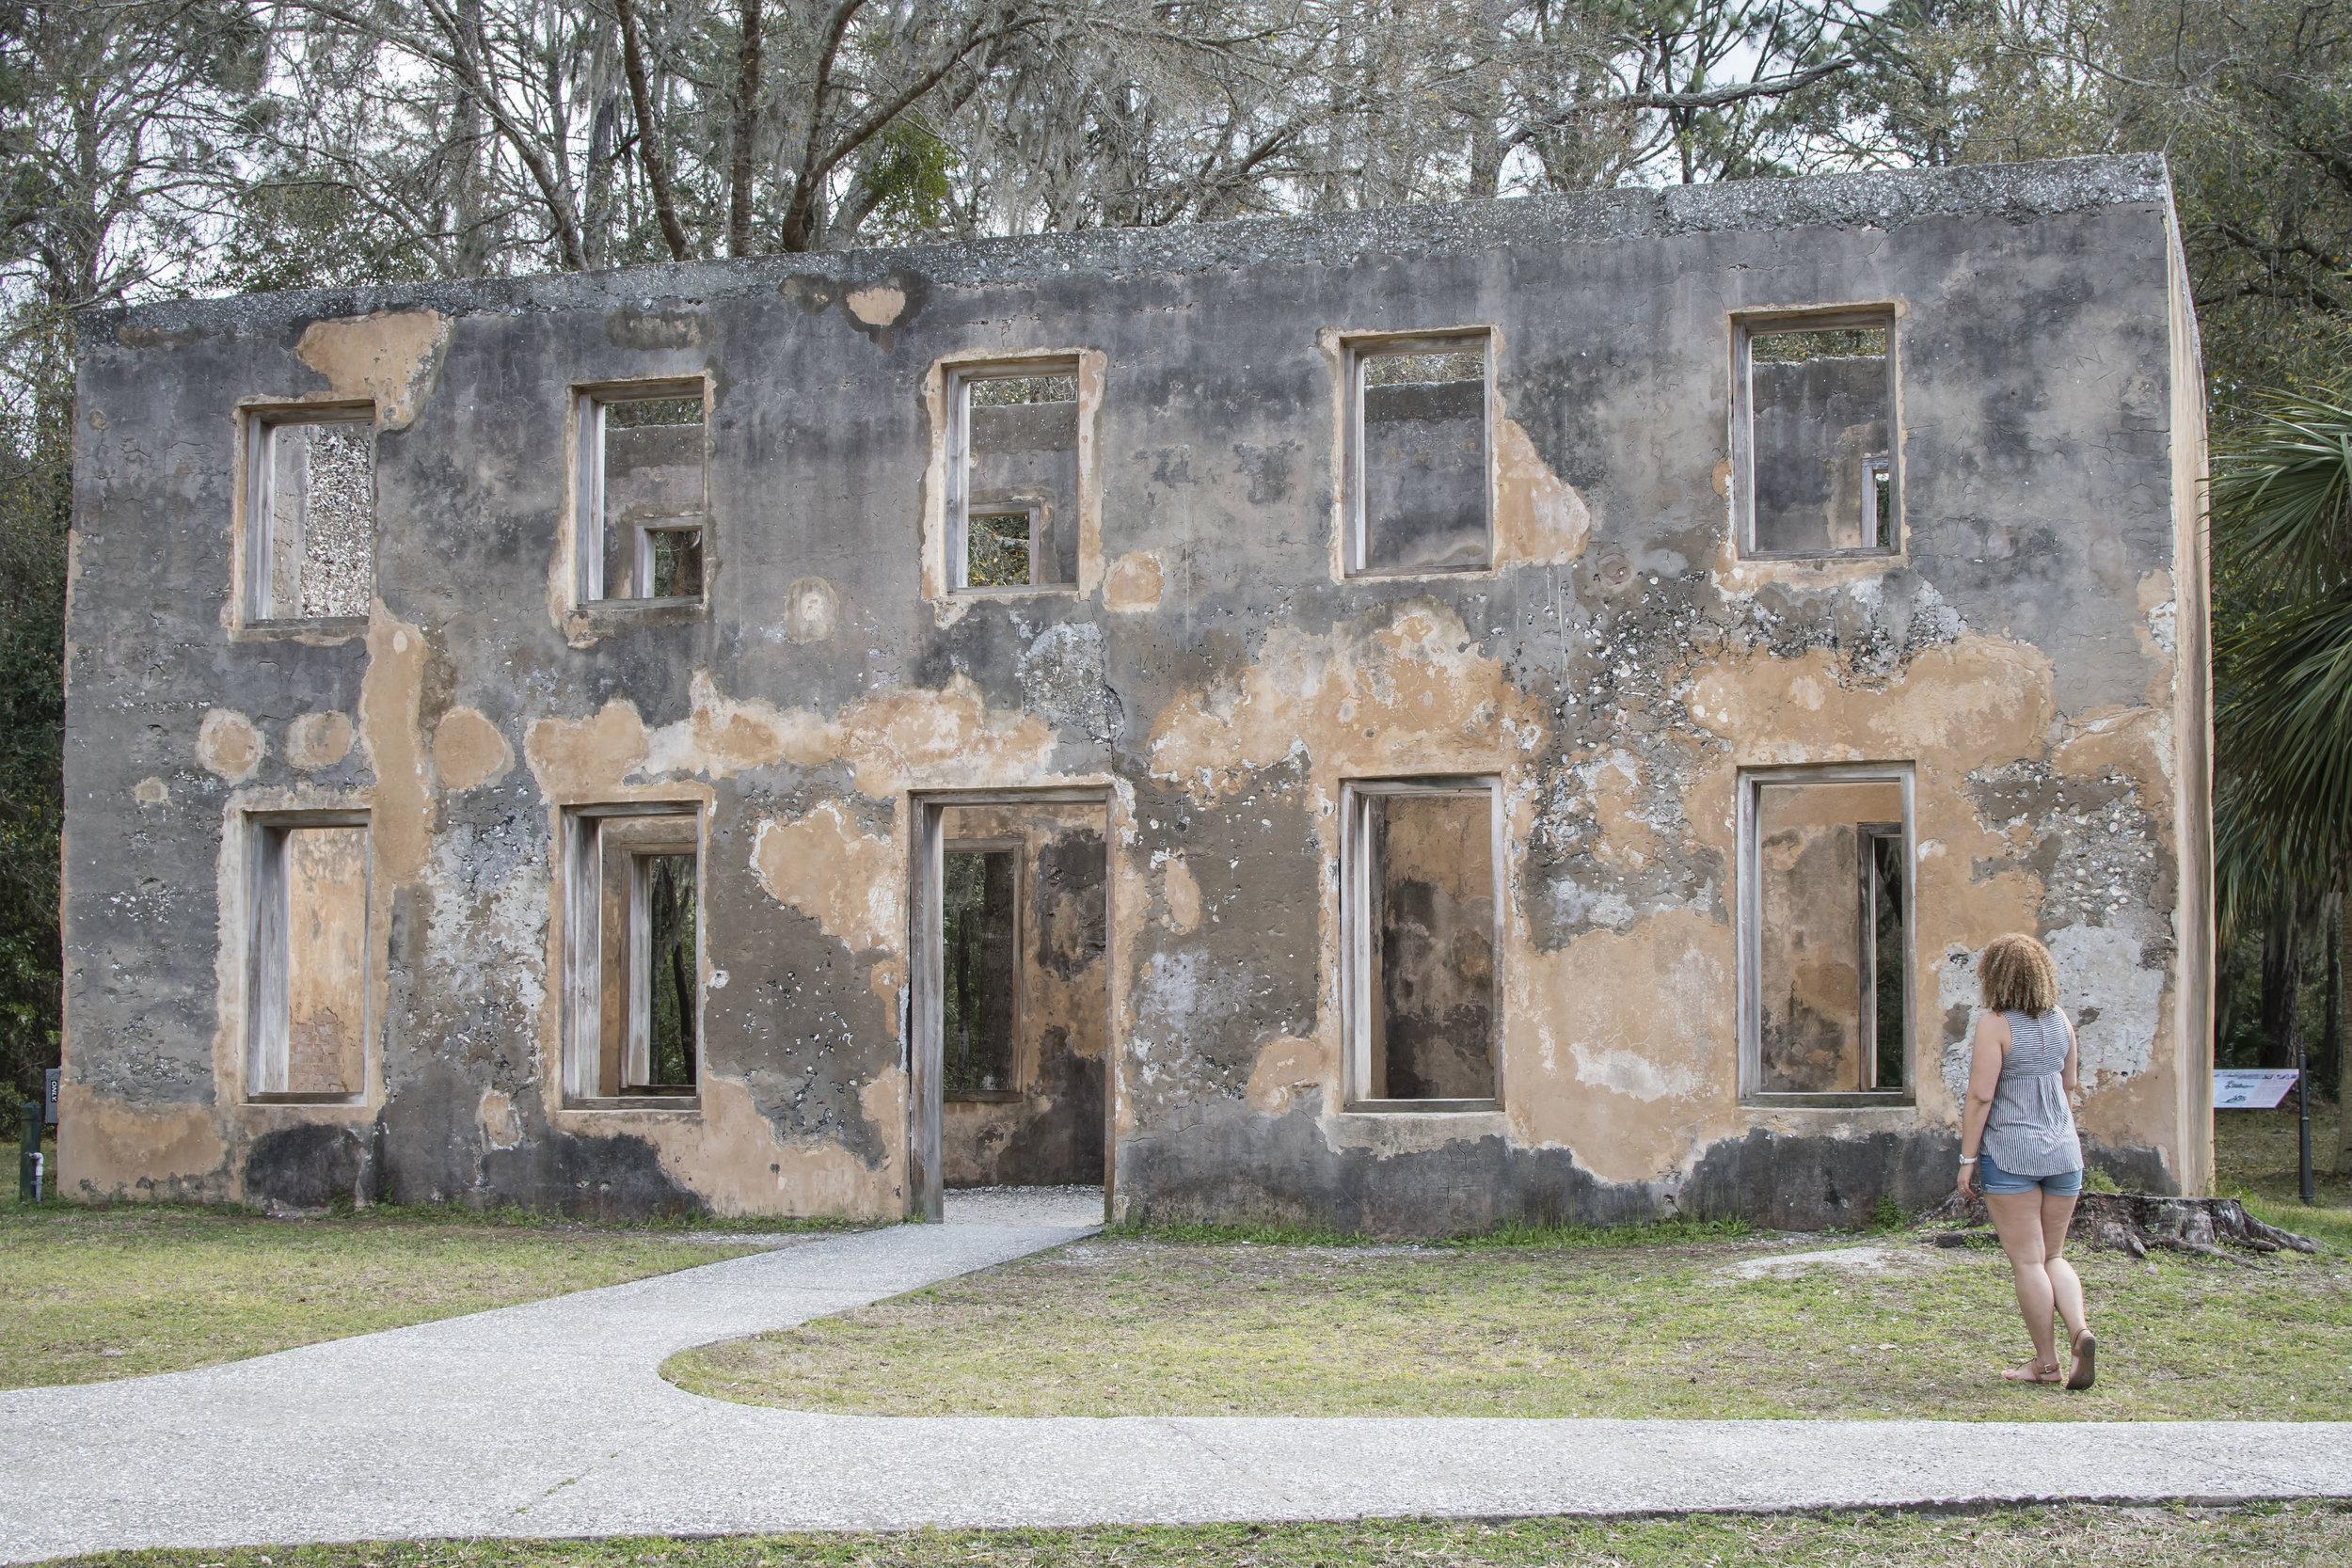 The Horton House ruins in Jekyll Island, GA